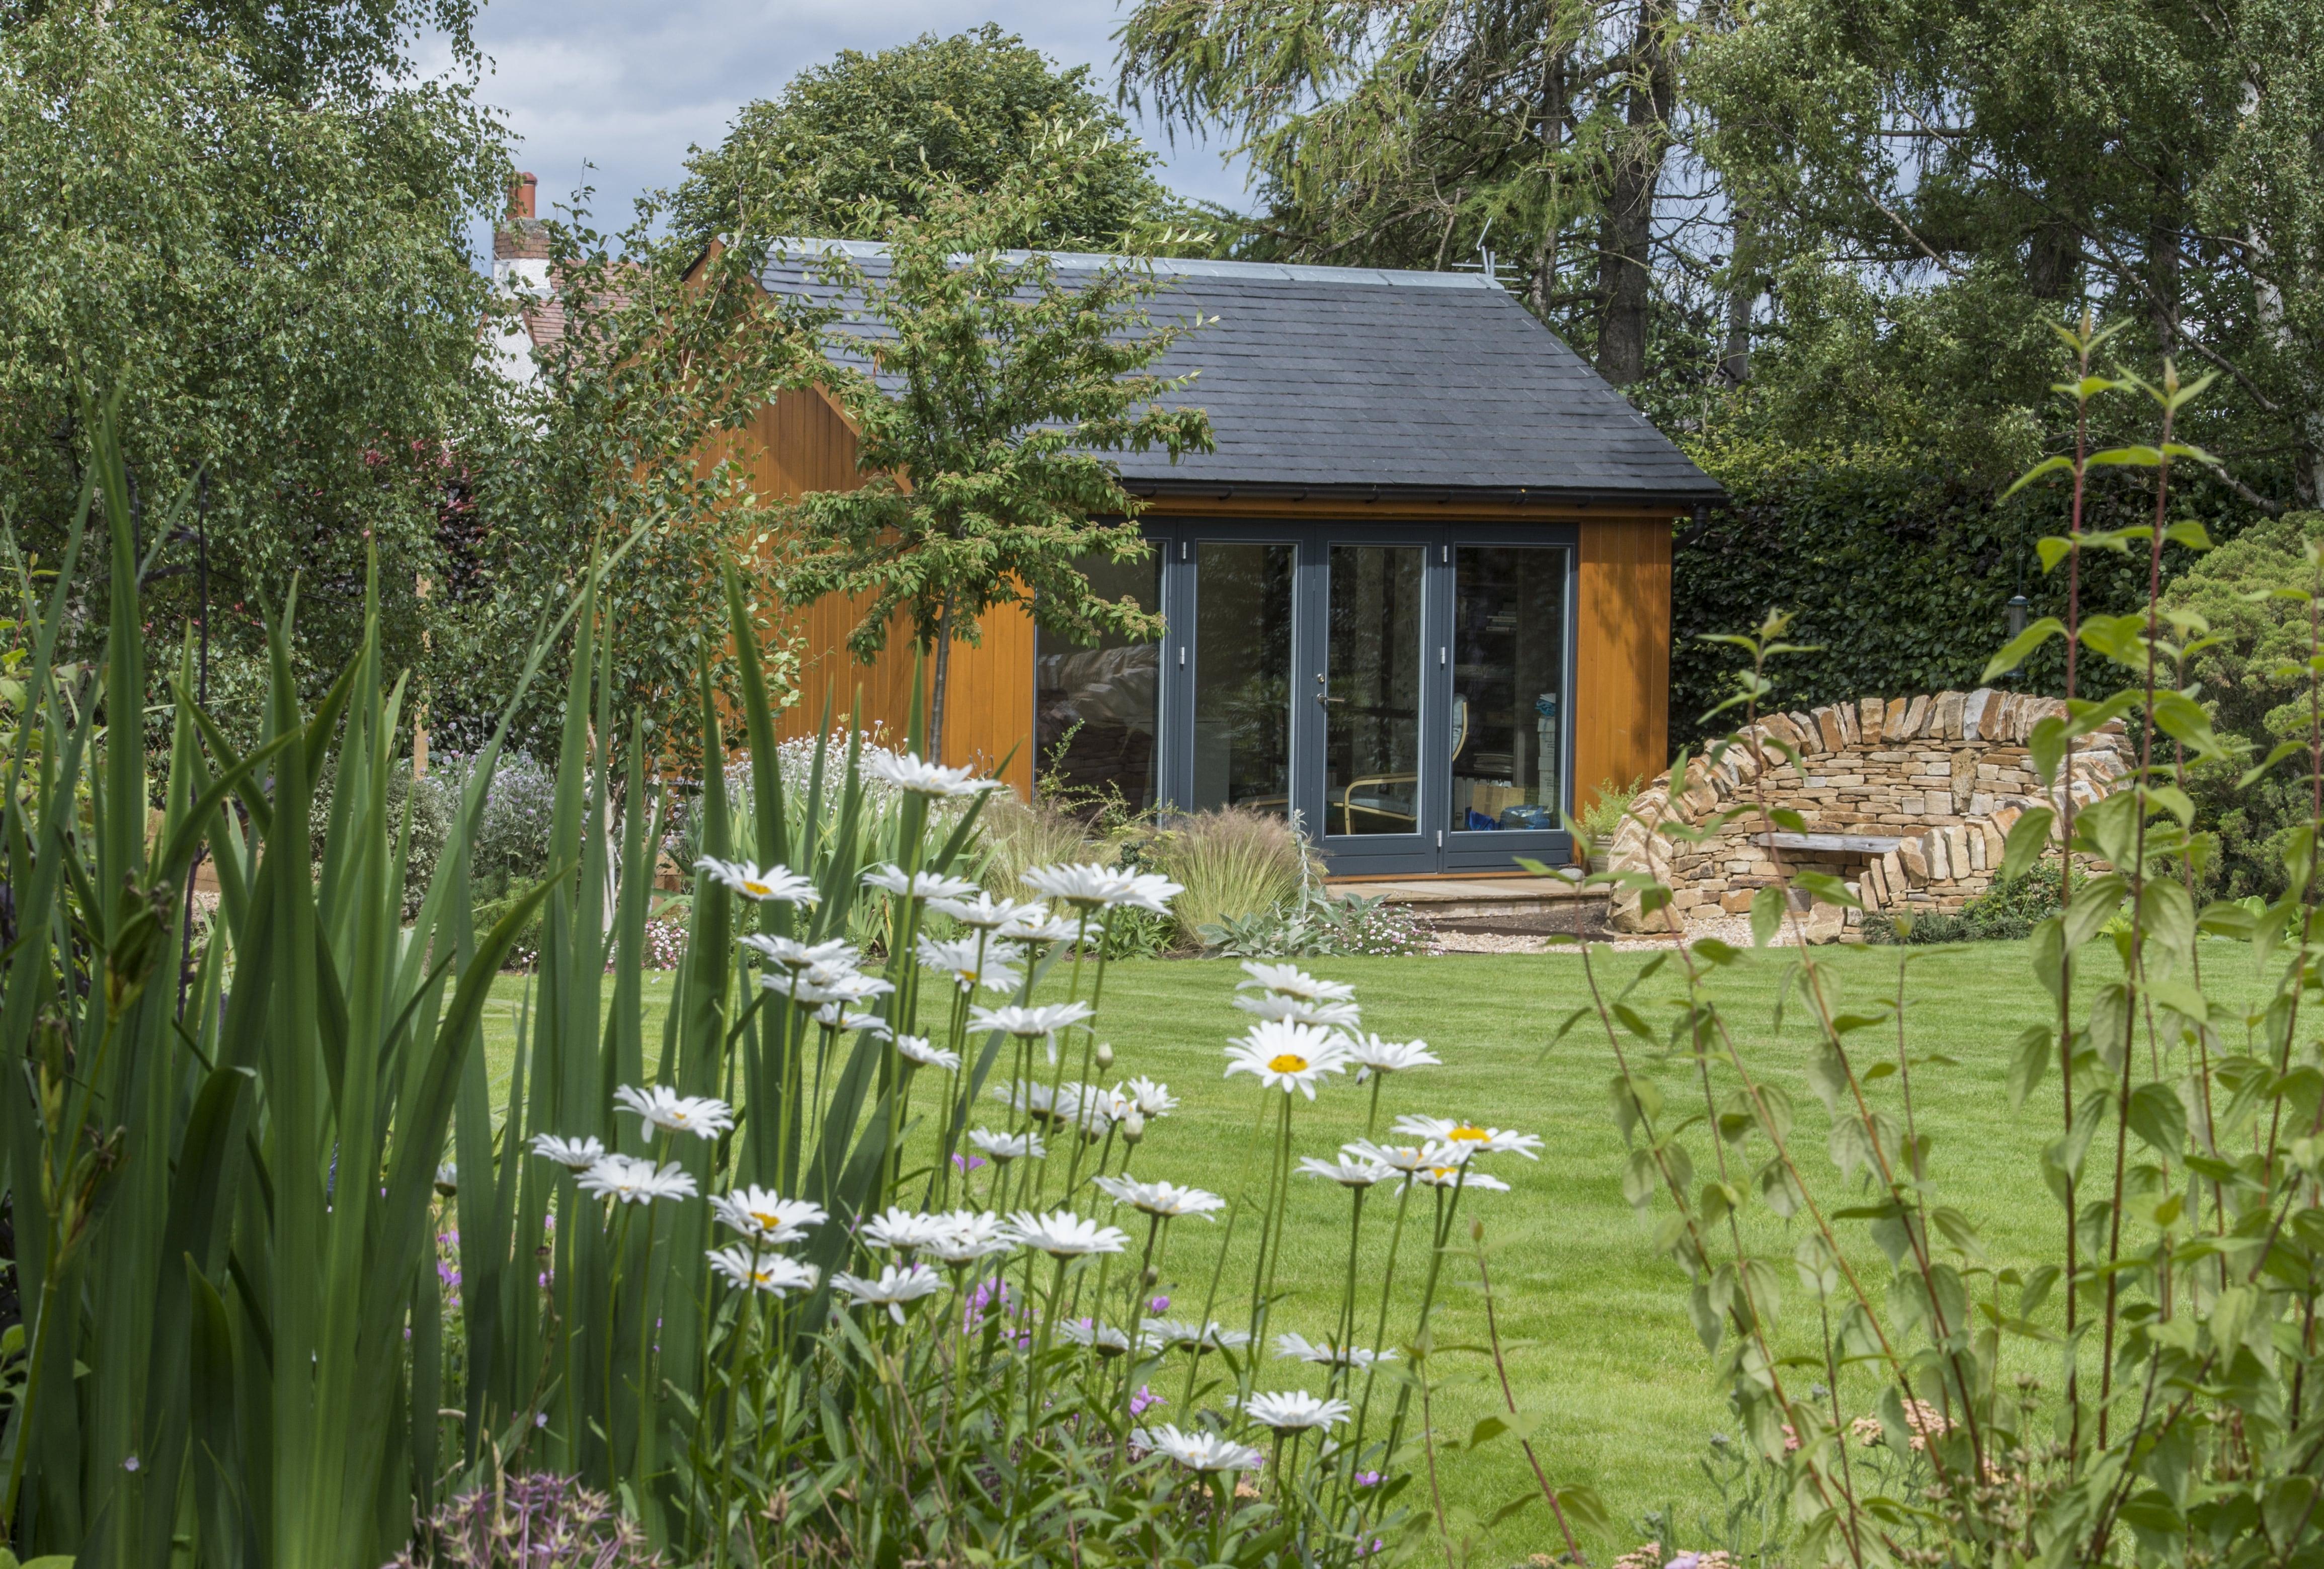 garden room and grass